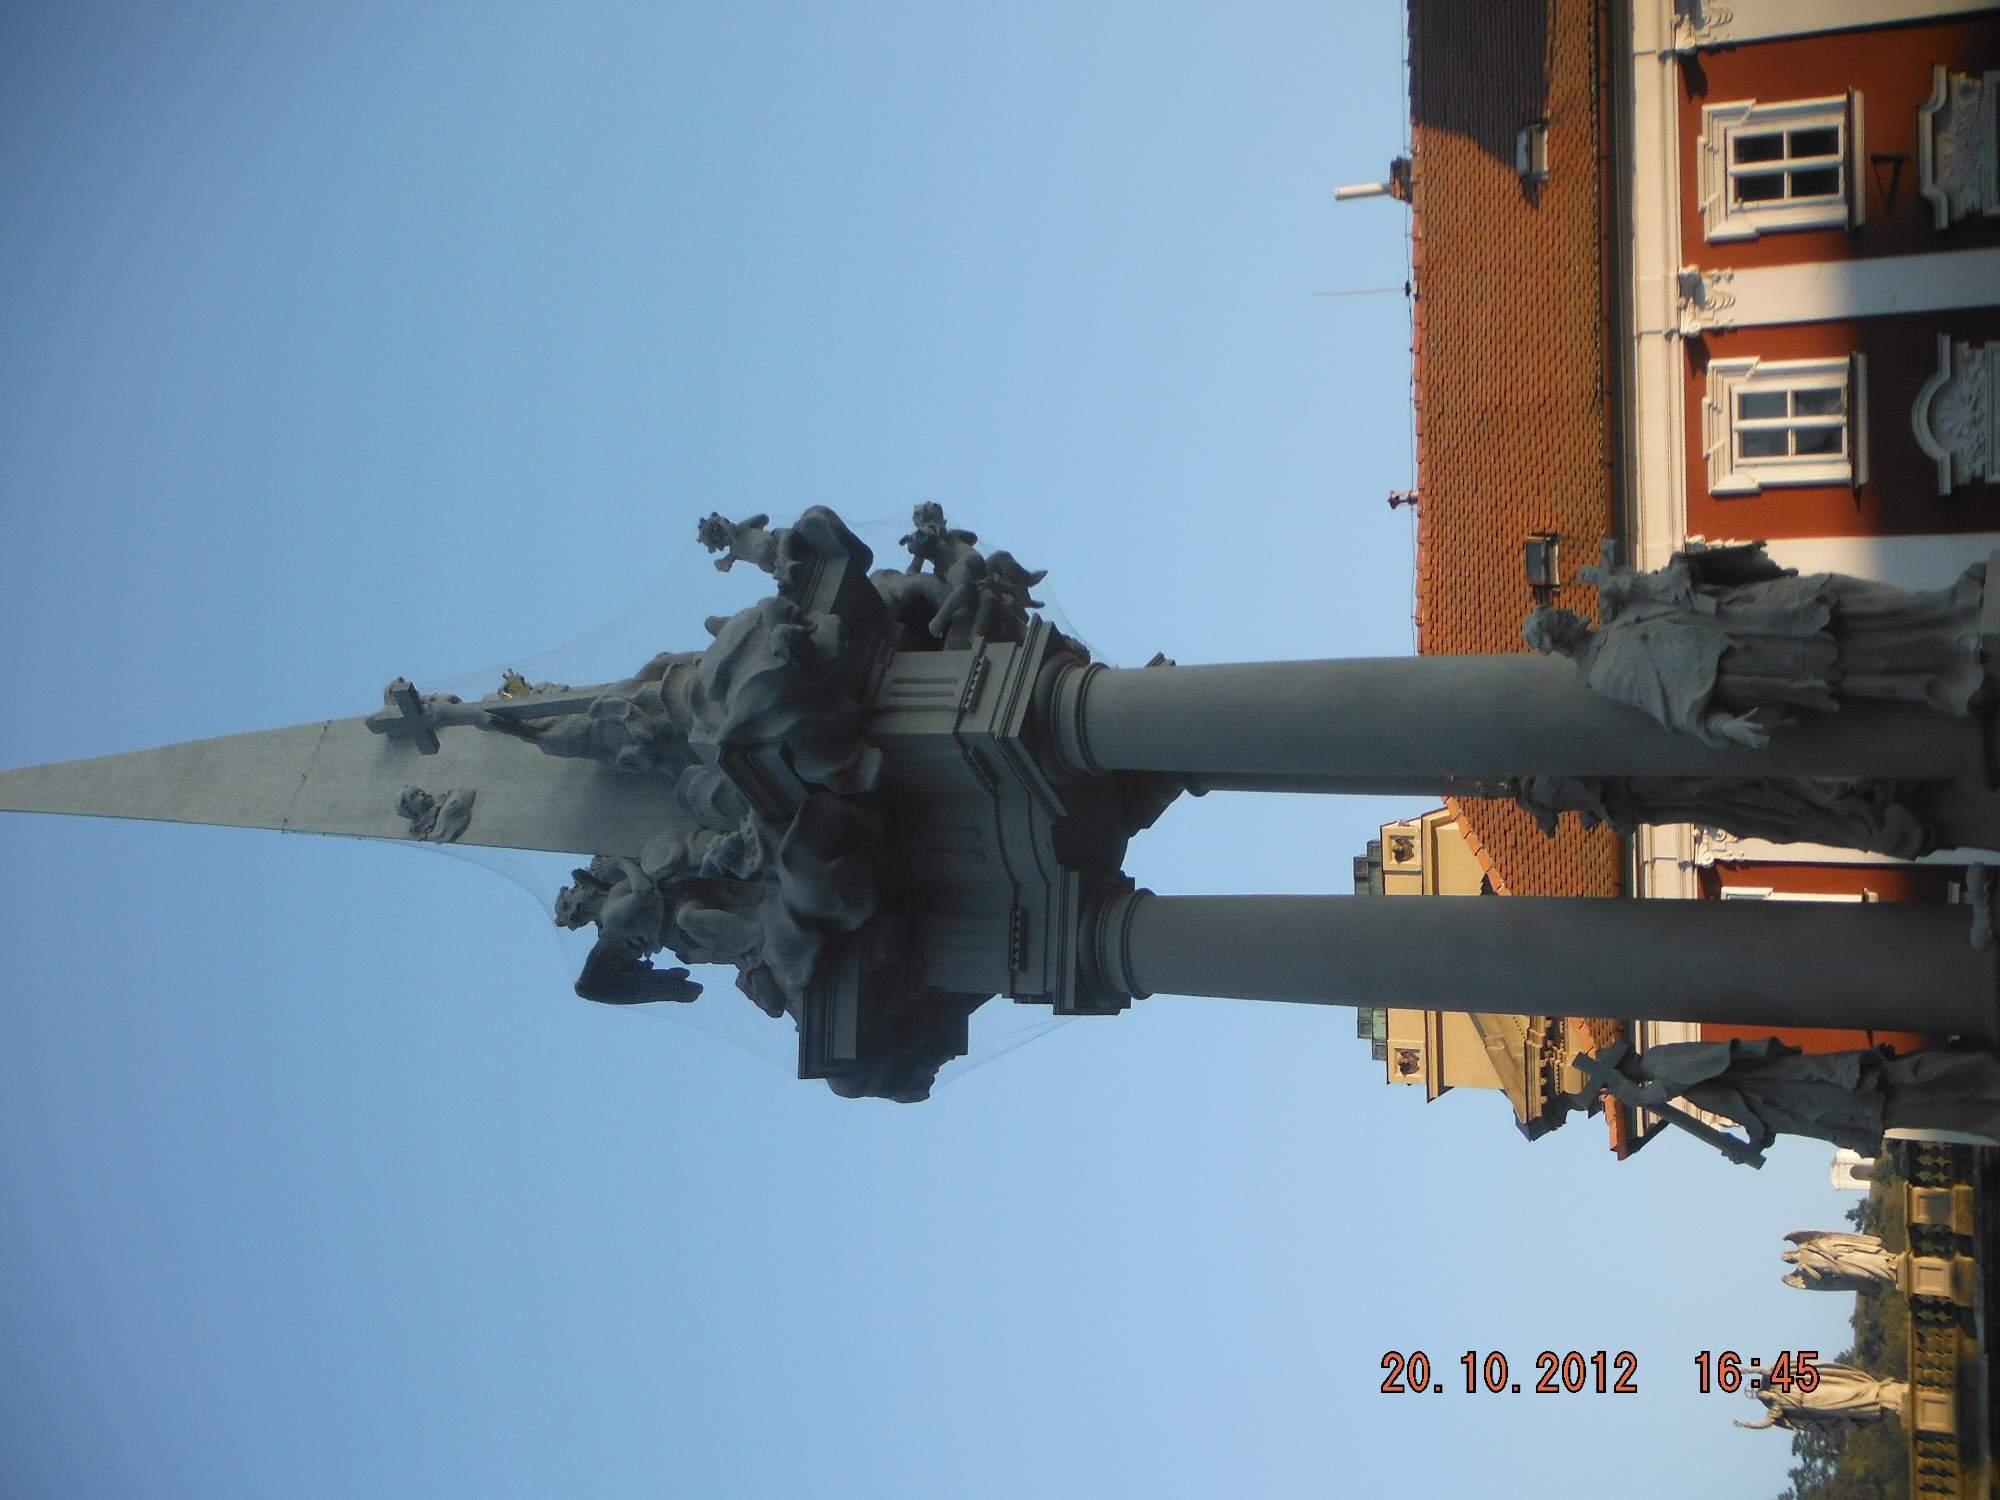 http://img24.rajce.idnes.cz/d2403/13/13214/13214242_a1e43f49e51a1daa7632f800d4edae3f/images/SAE642.jpg